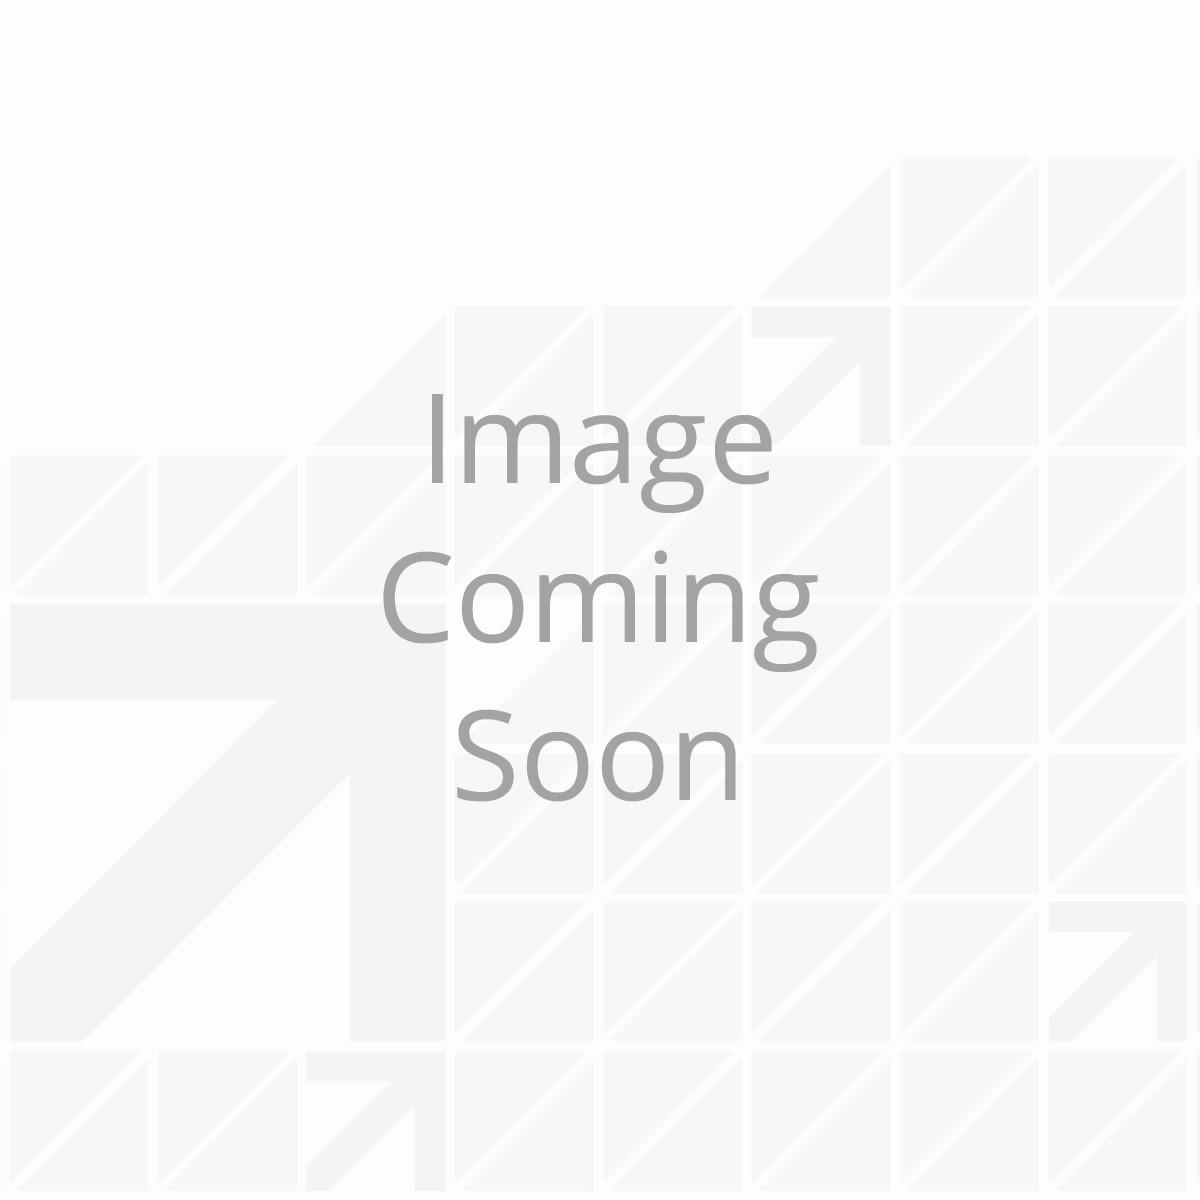 19' Power & Hybrid Awning Roller Assembly - Prepflex Silver Fade